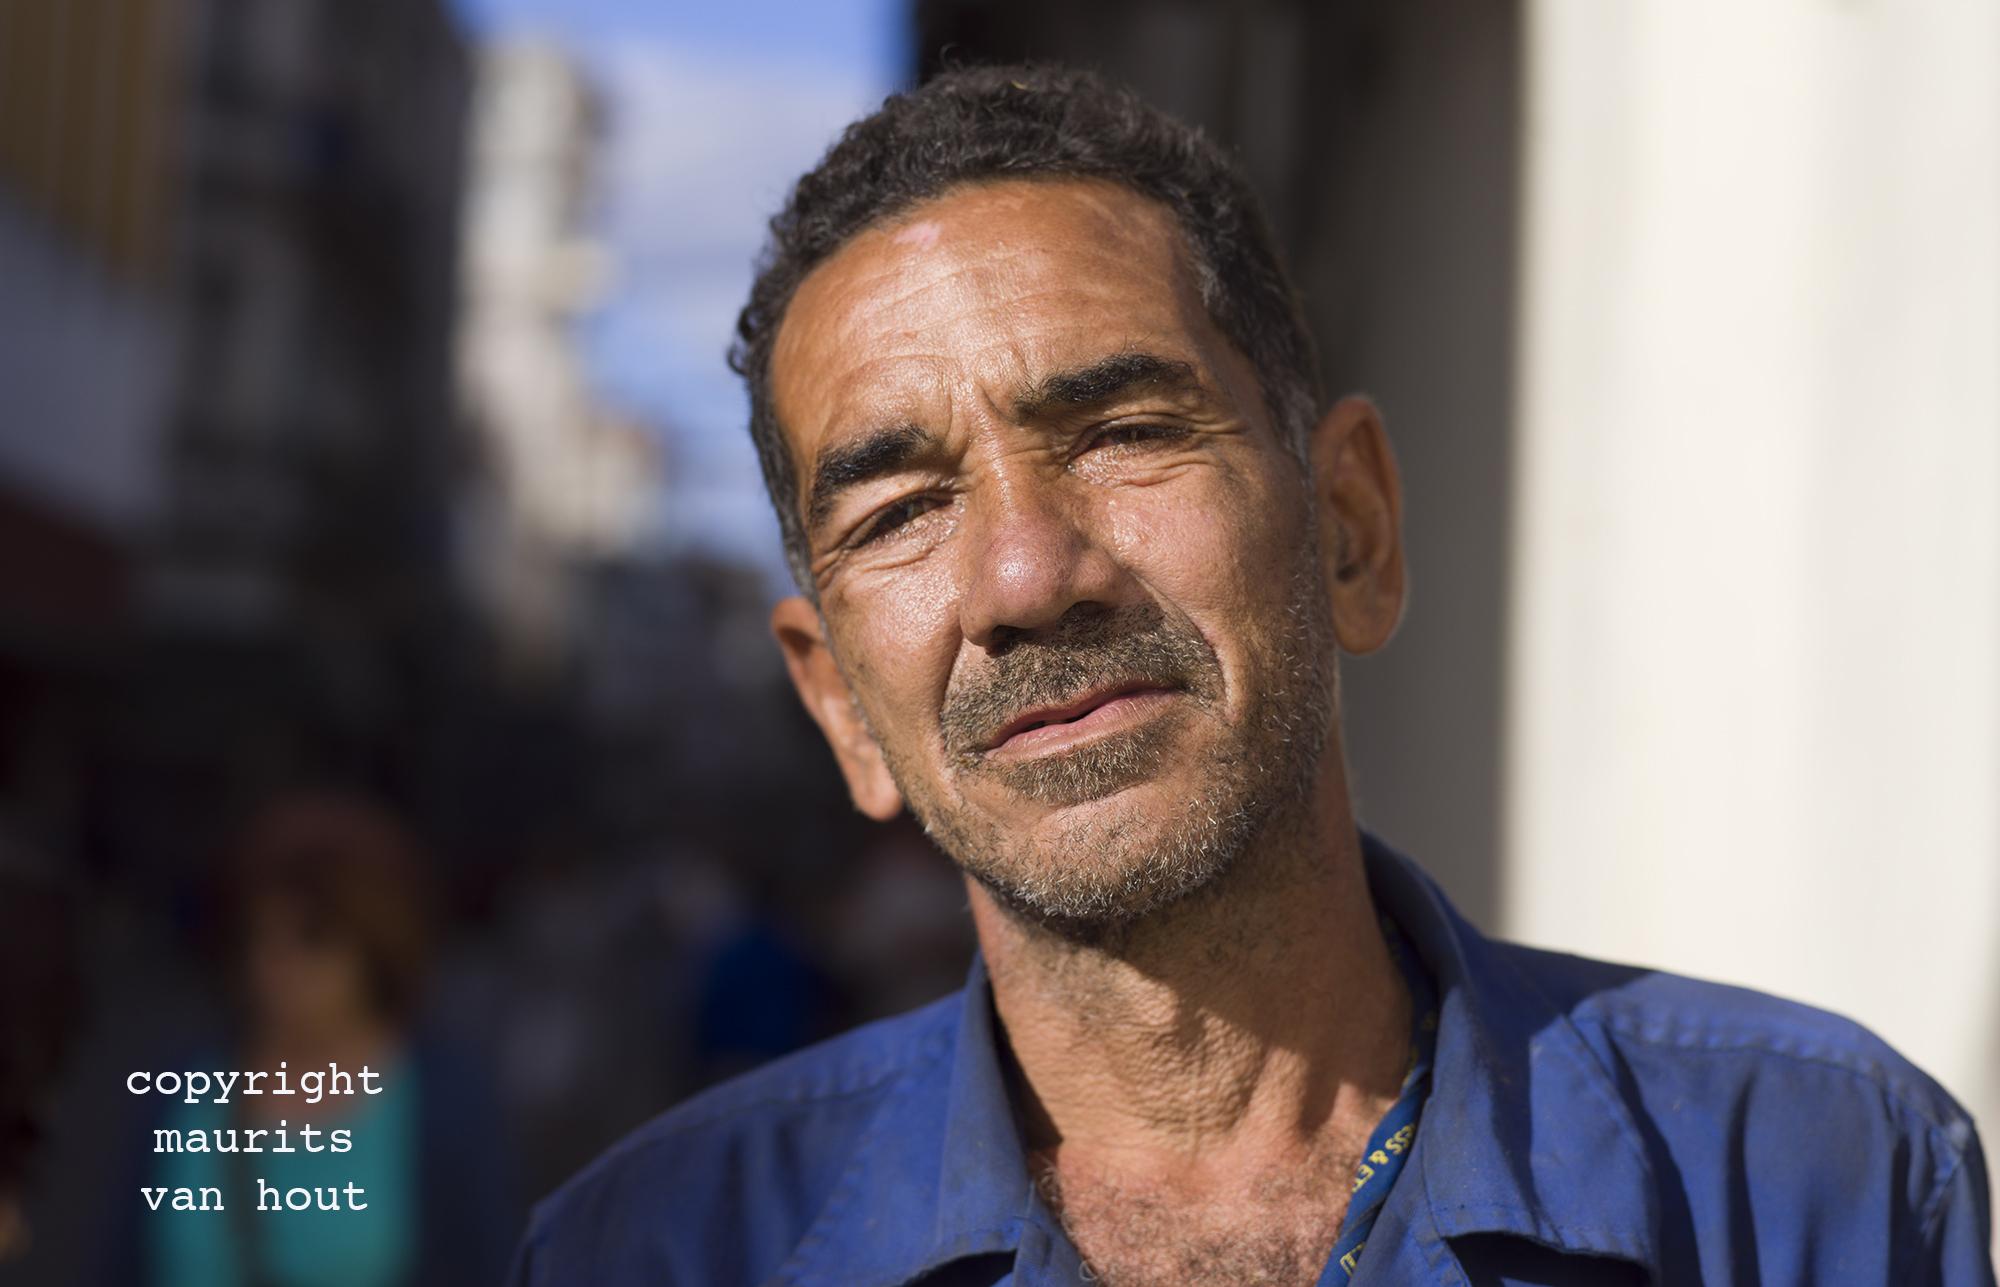 portrait of a man, Havana Cuba, by Dutch photographer Maurits van Hout